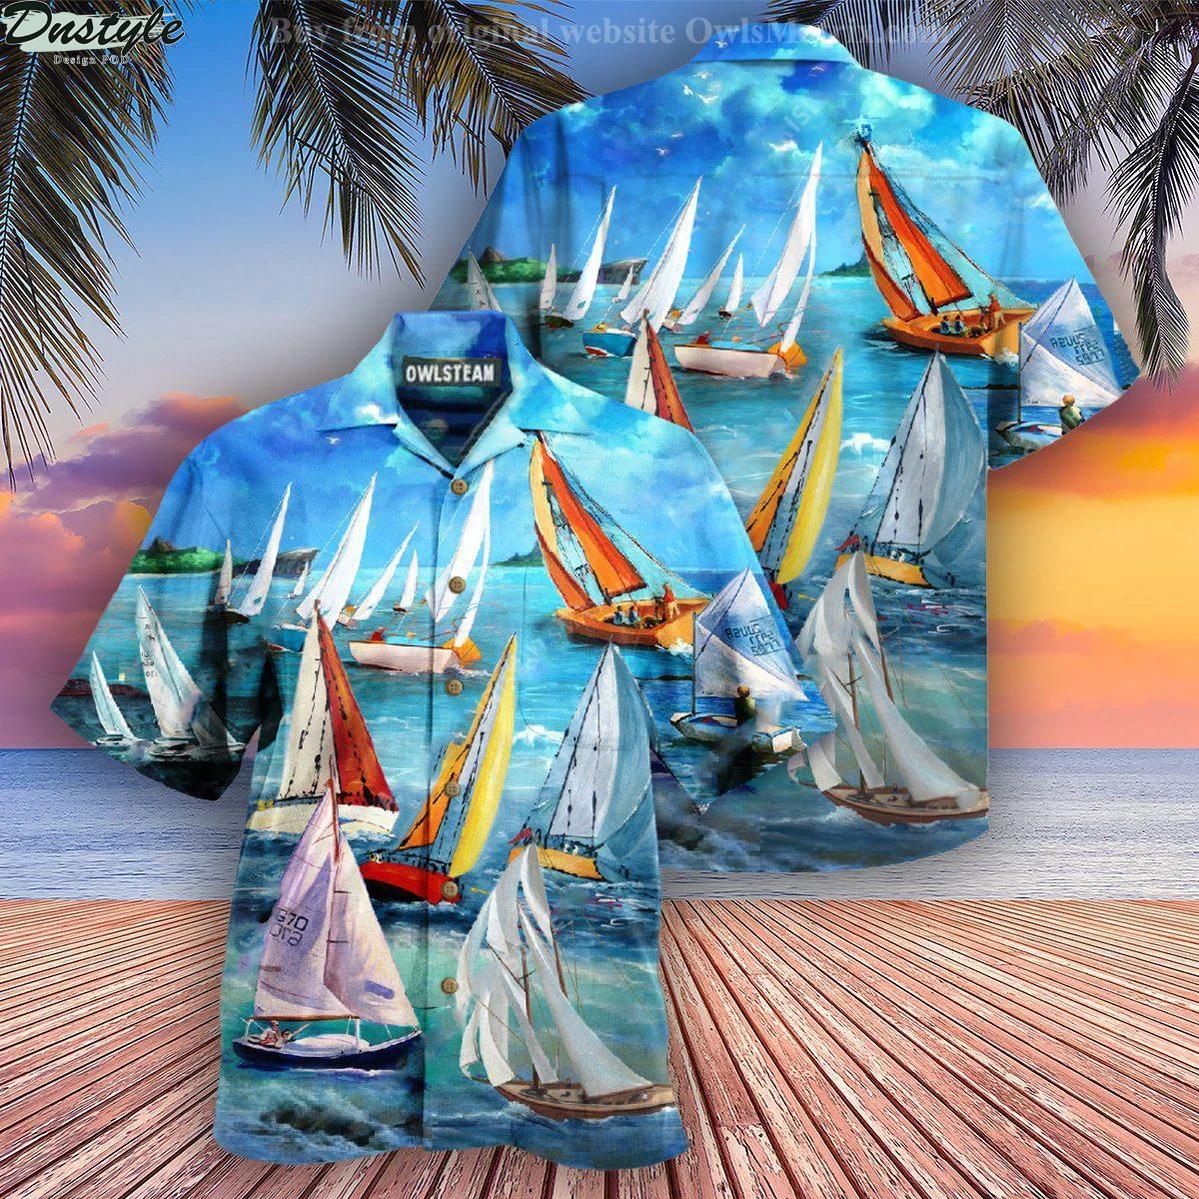 Sail raise the sails to catch the wind hawaiian shirt